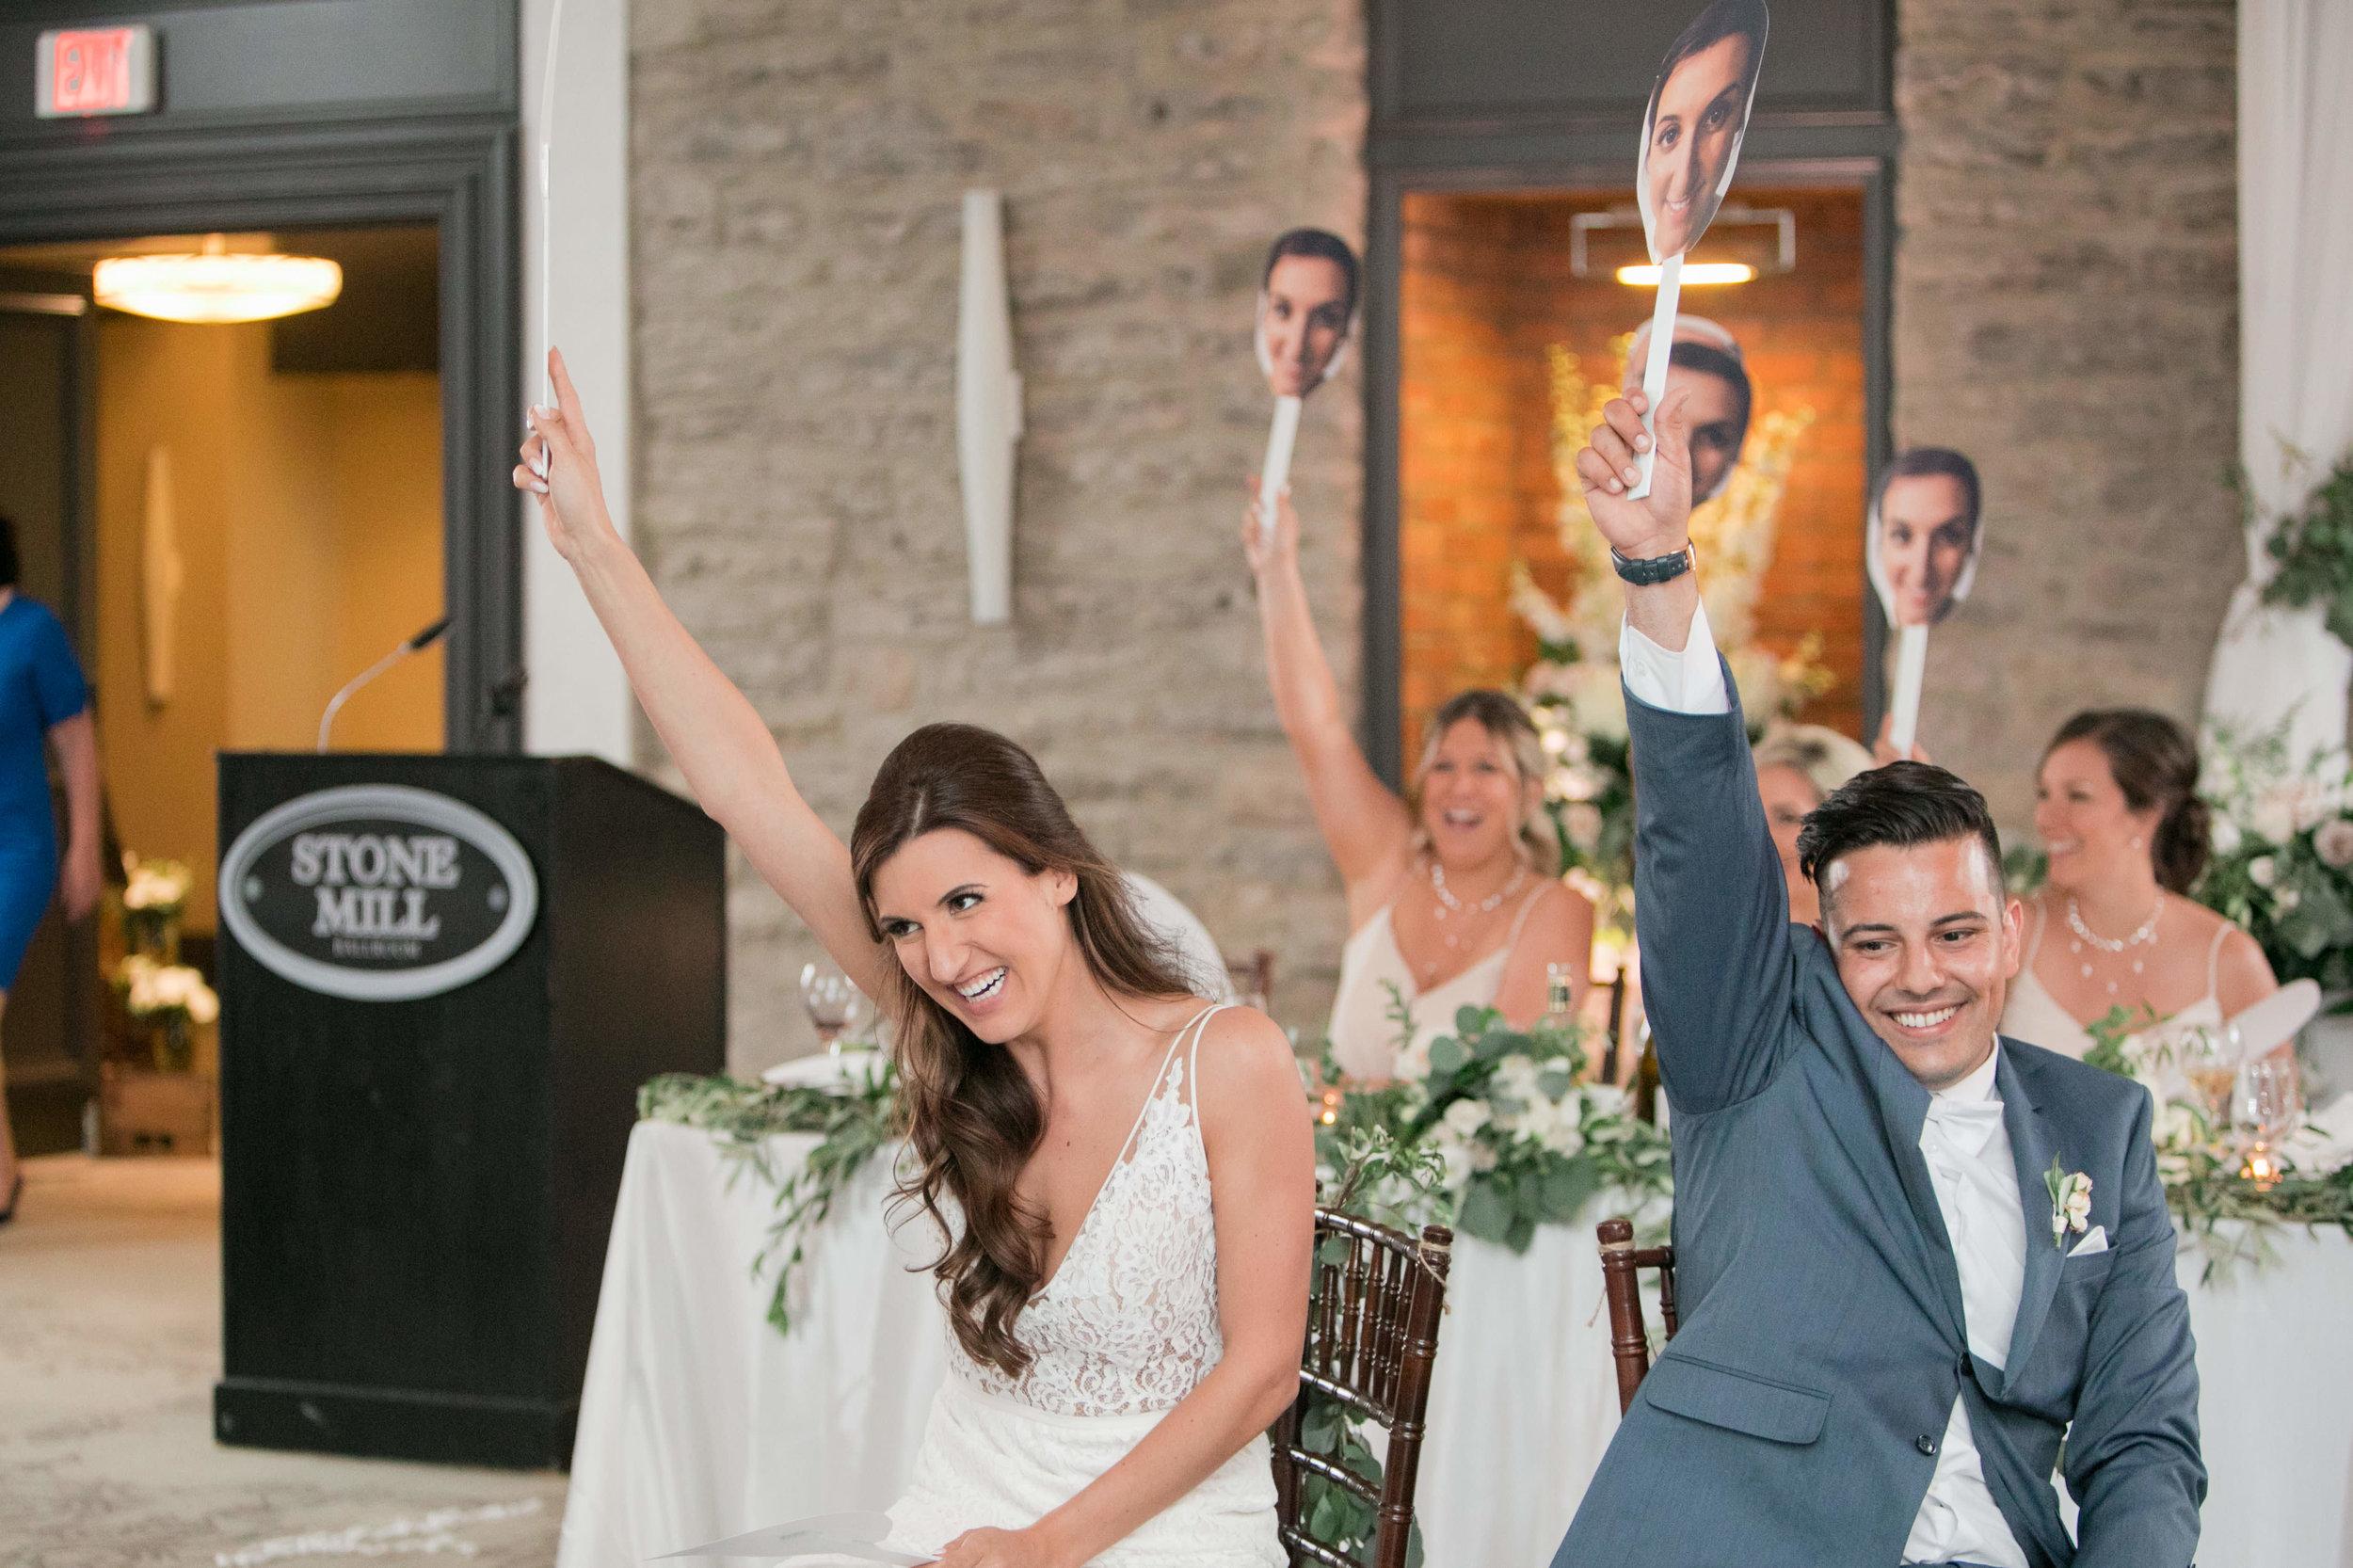 Miranda___Daniel___Daniel_Ricci_Weddings___High_Res._Finals_652.jpg